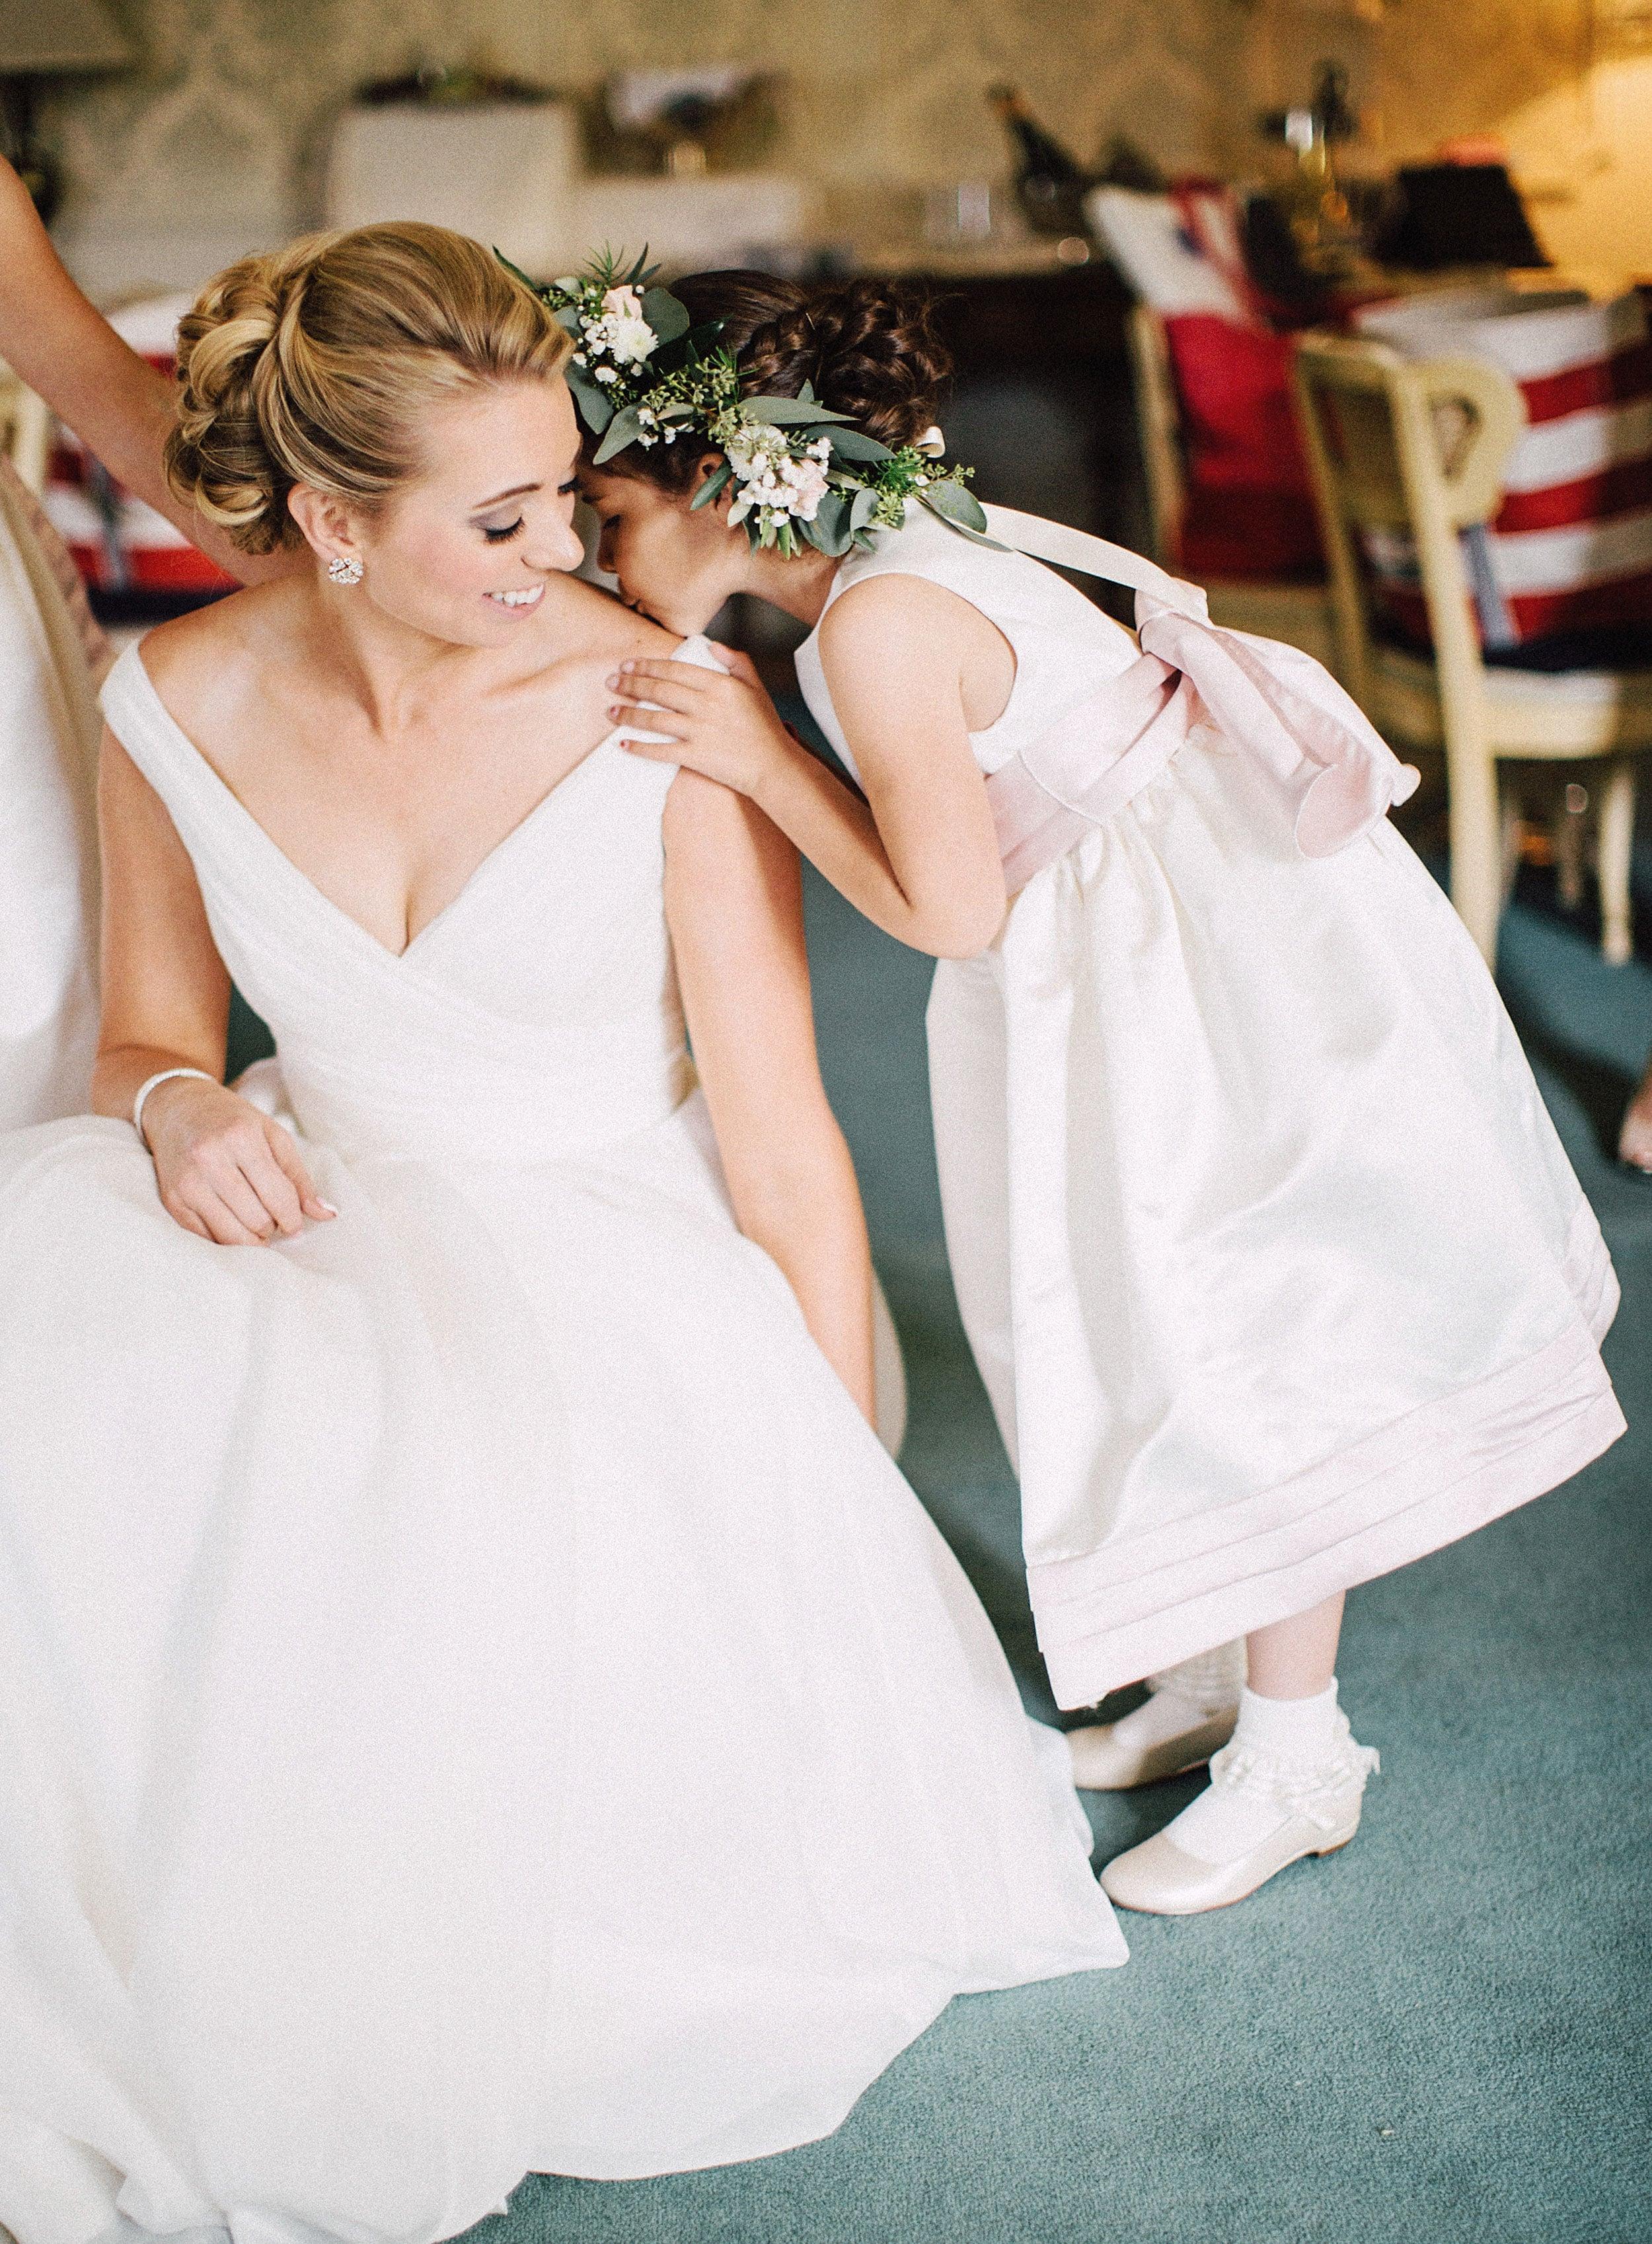 spindletop-lexington-wedding-photographer-012.JPG